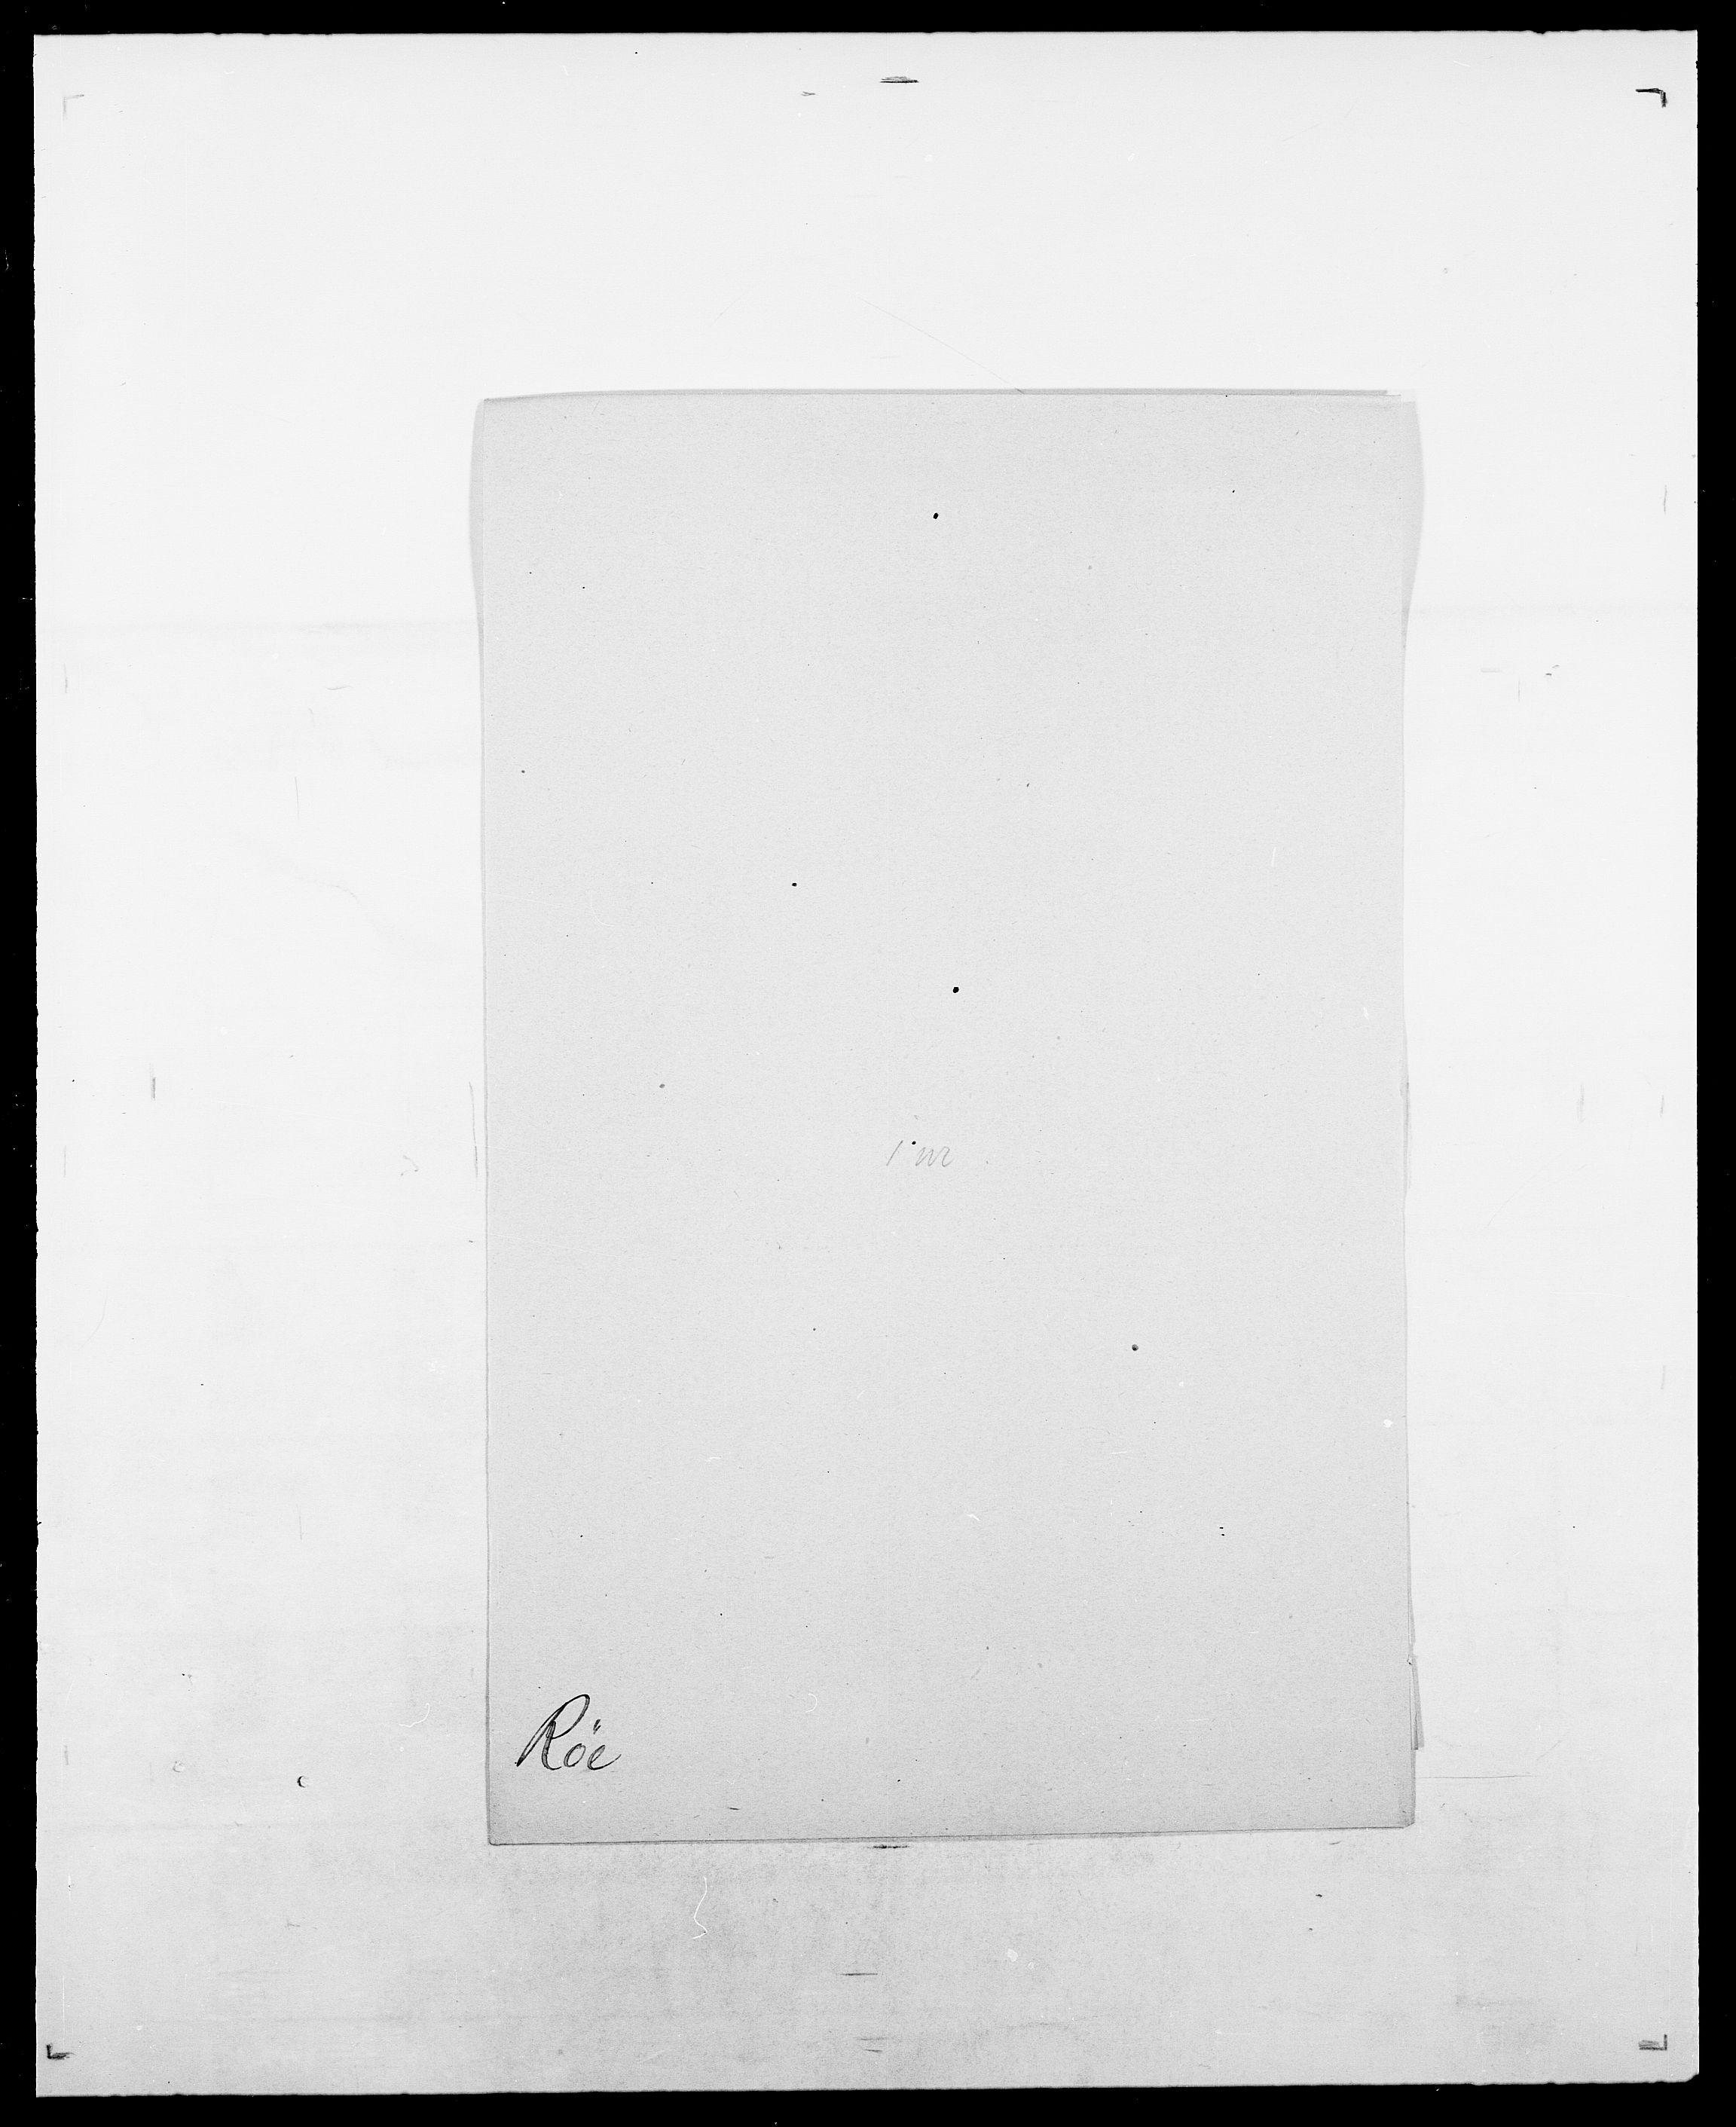 SAO, Delgobe, Charles Antoine - samling, D/Da/L0033: Roald - Røyem, s. 667